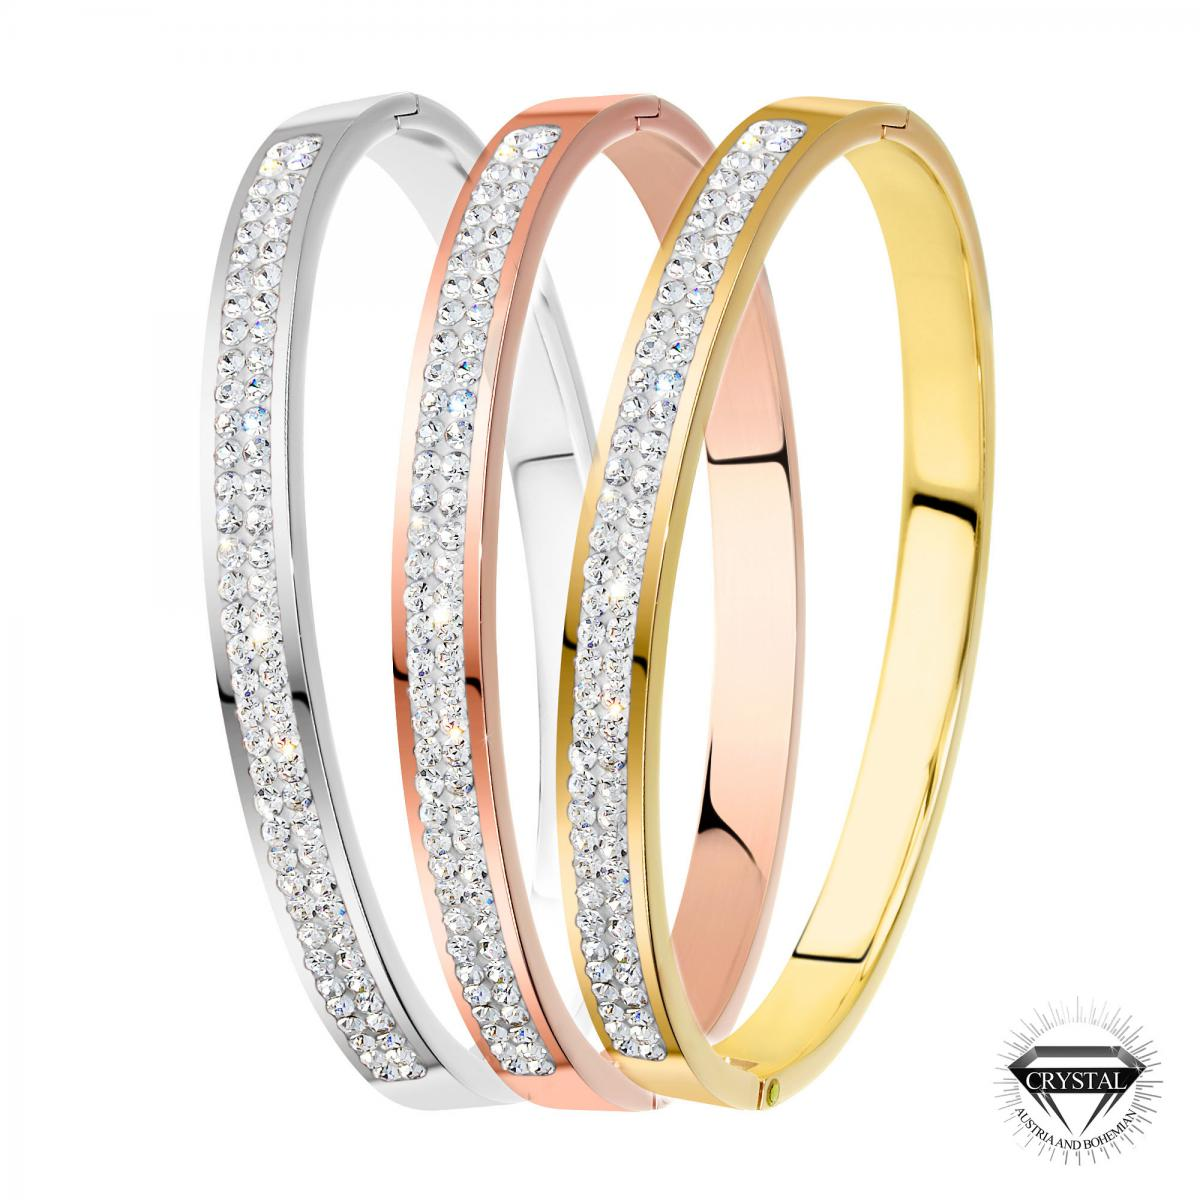 Bracelet So Charm B1715-TRIO Femme